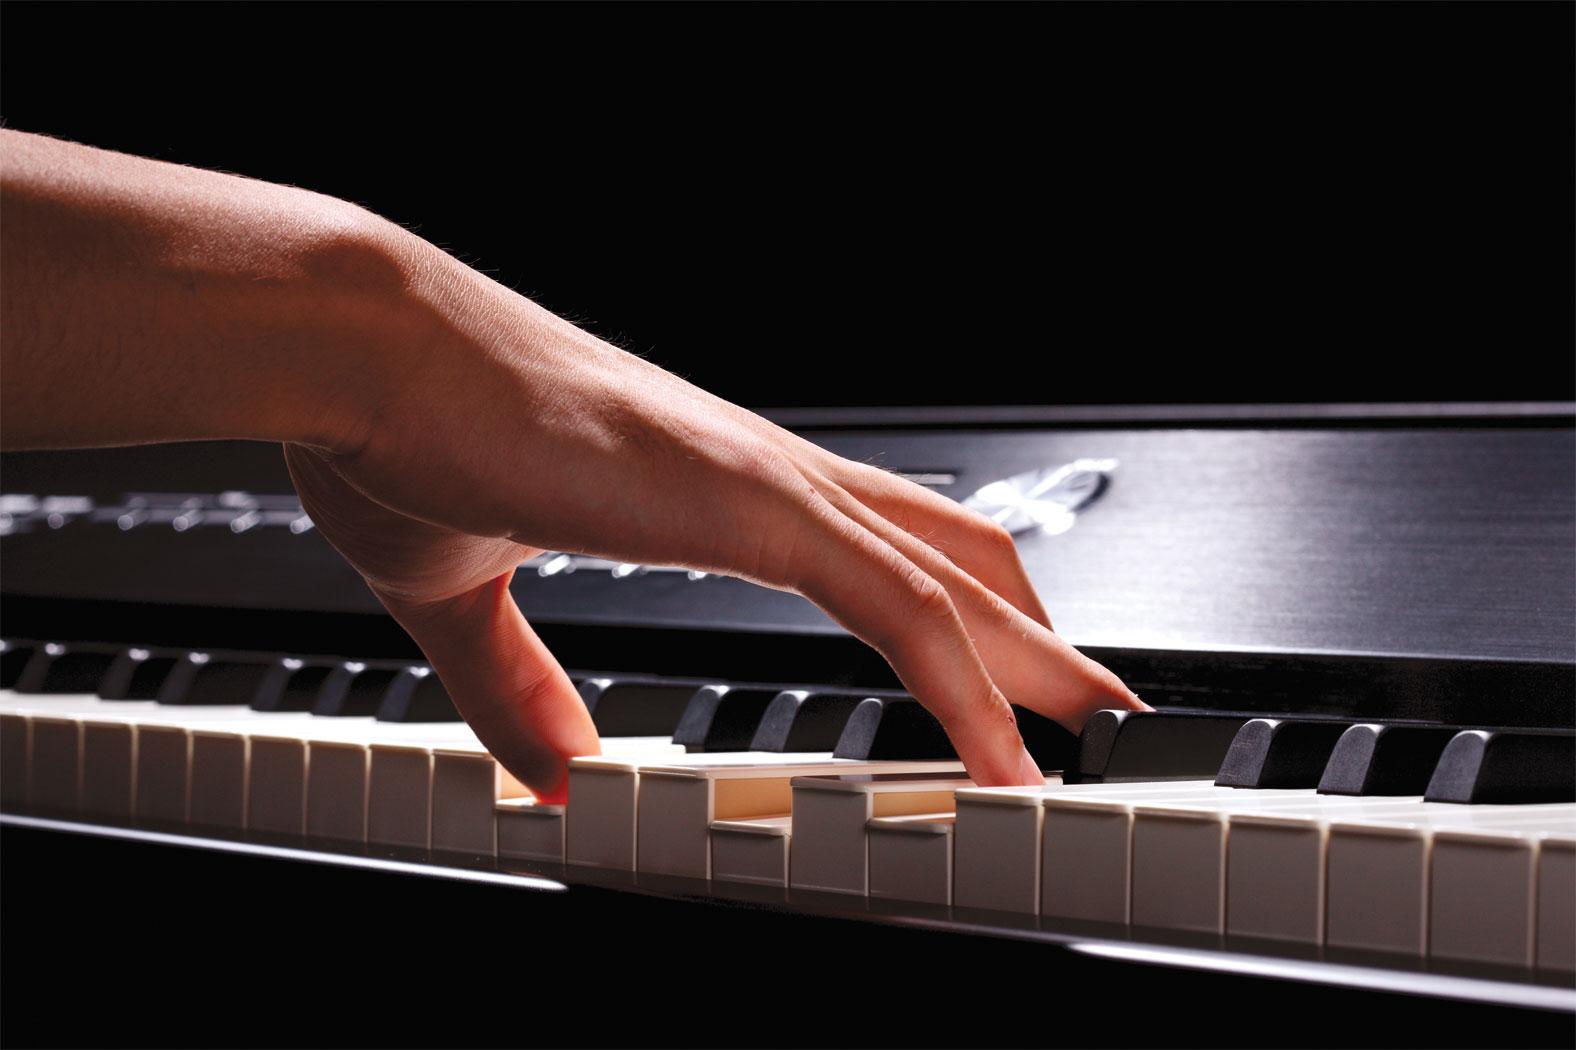 v_piano_keys_hand_gal